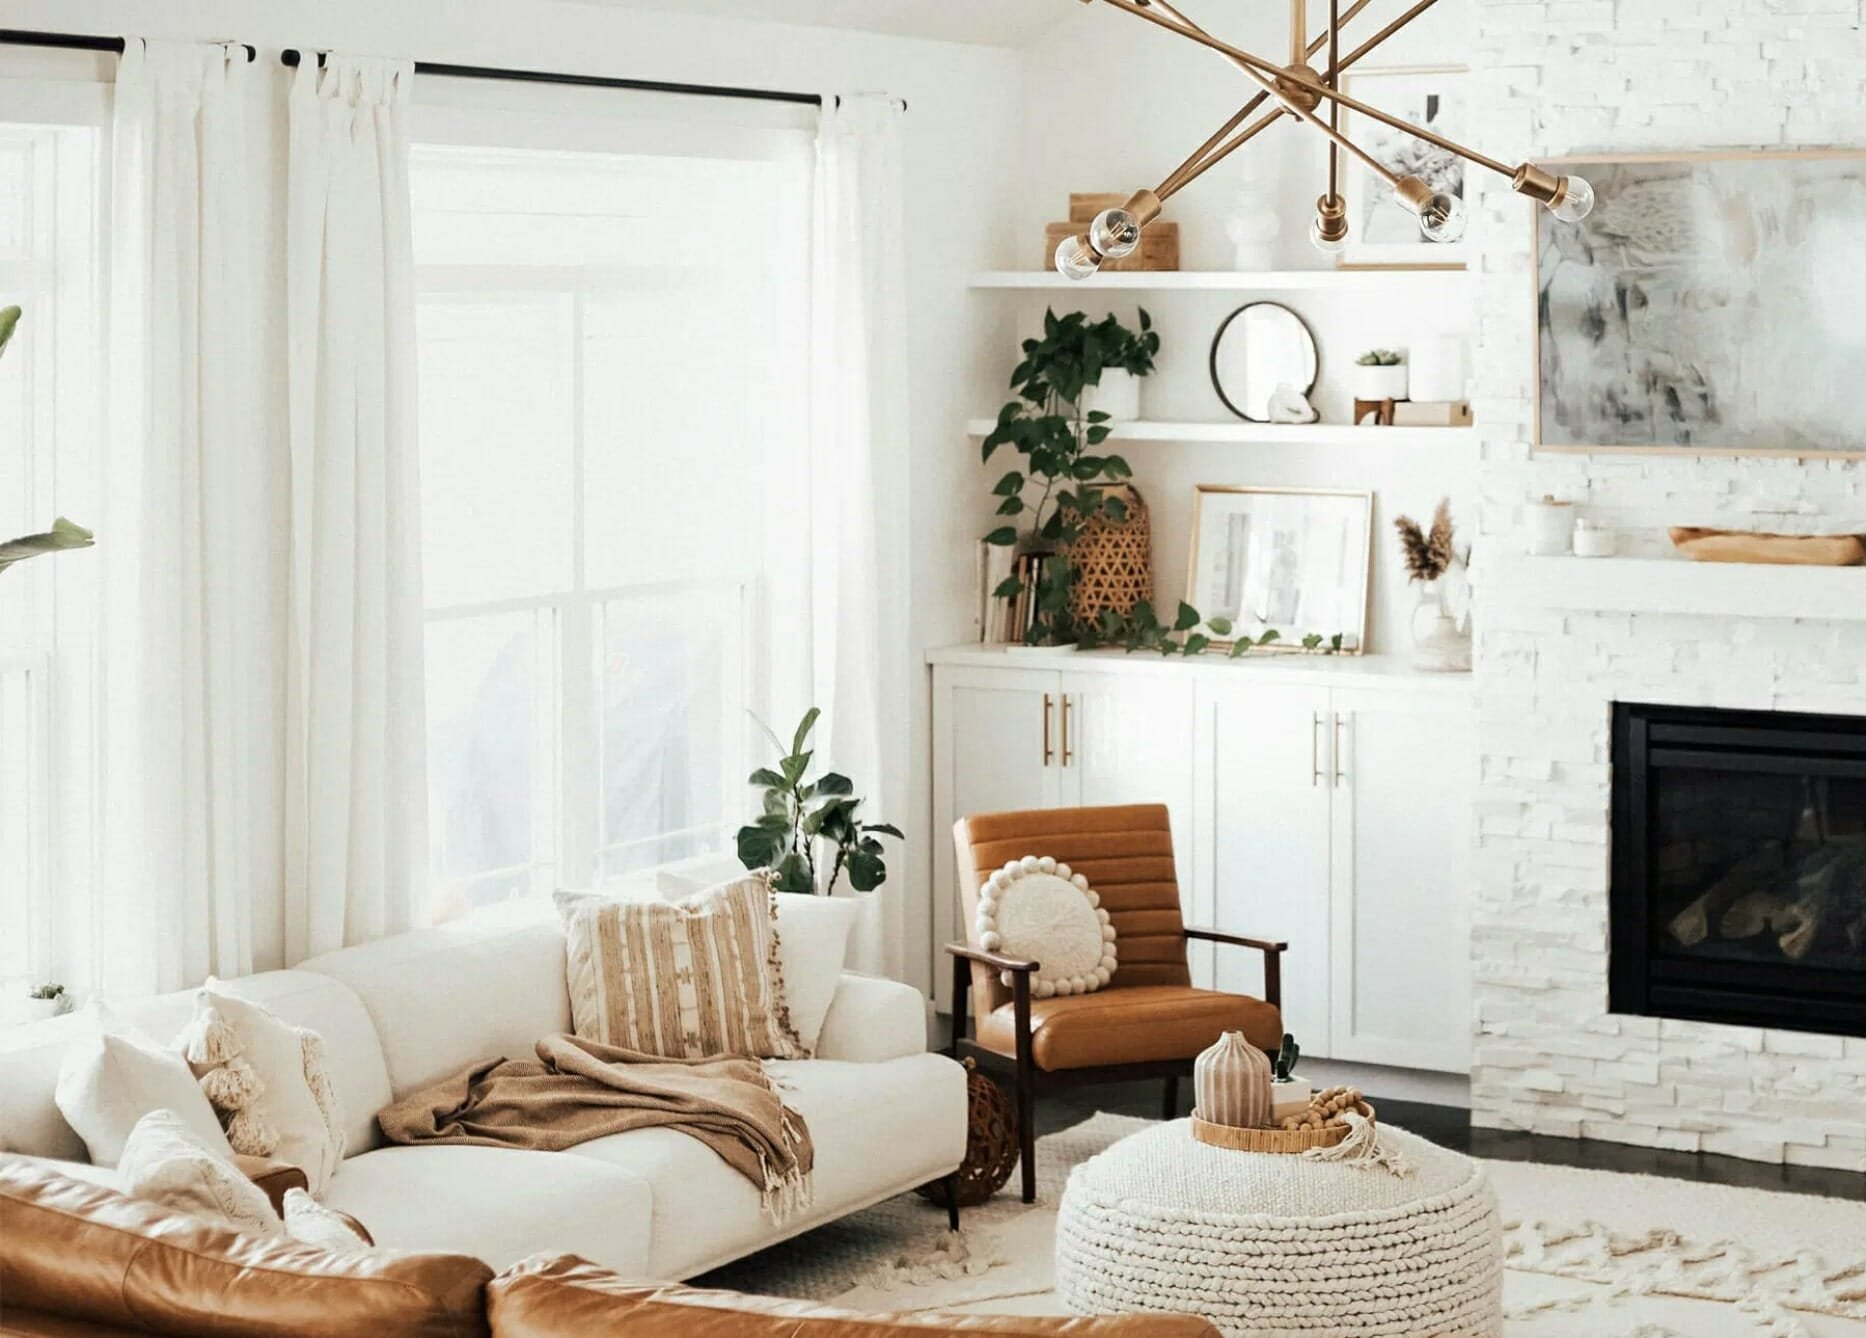 Cozy Bohemian interior design living room - Article